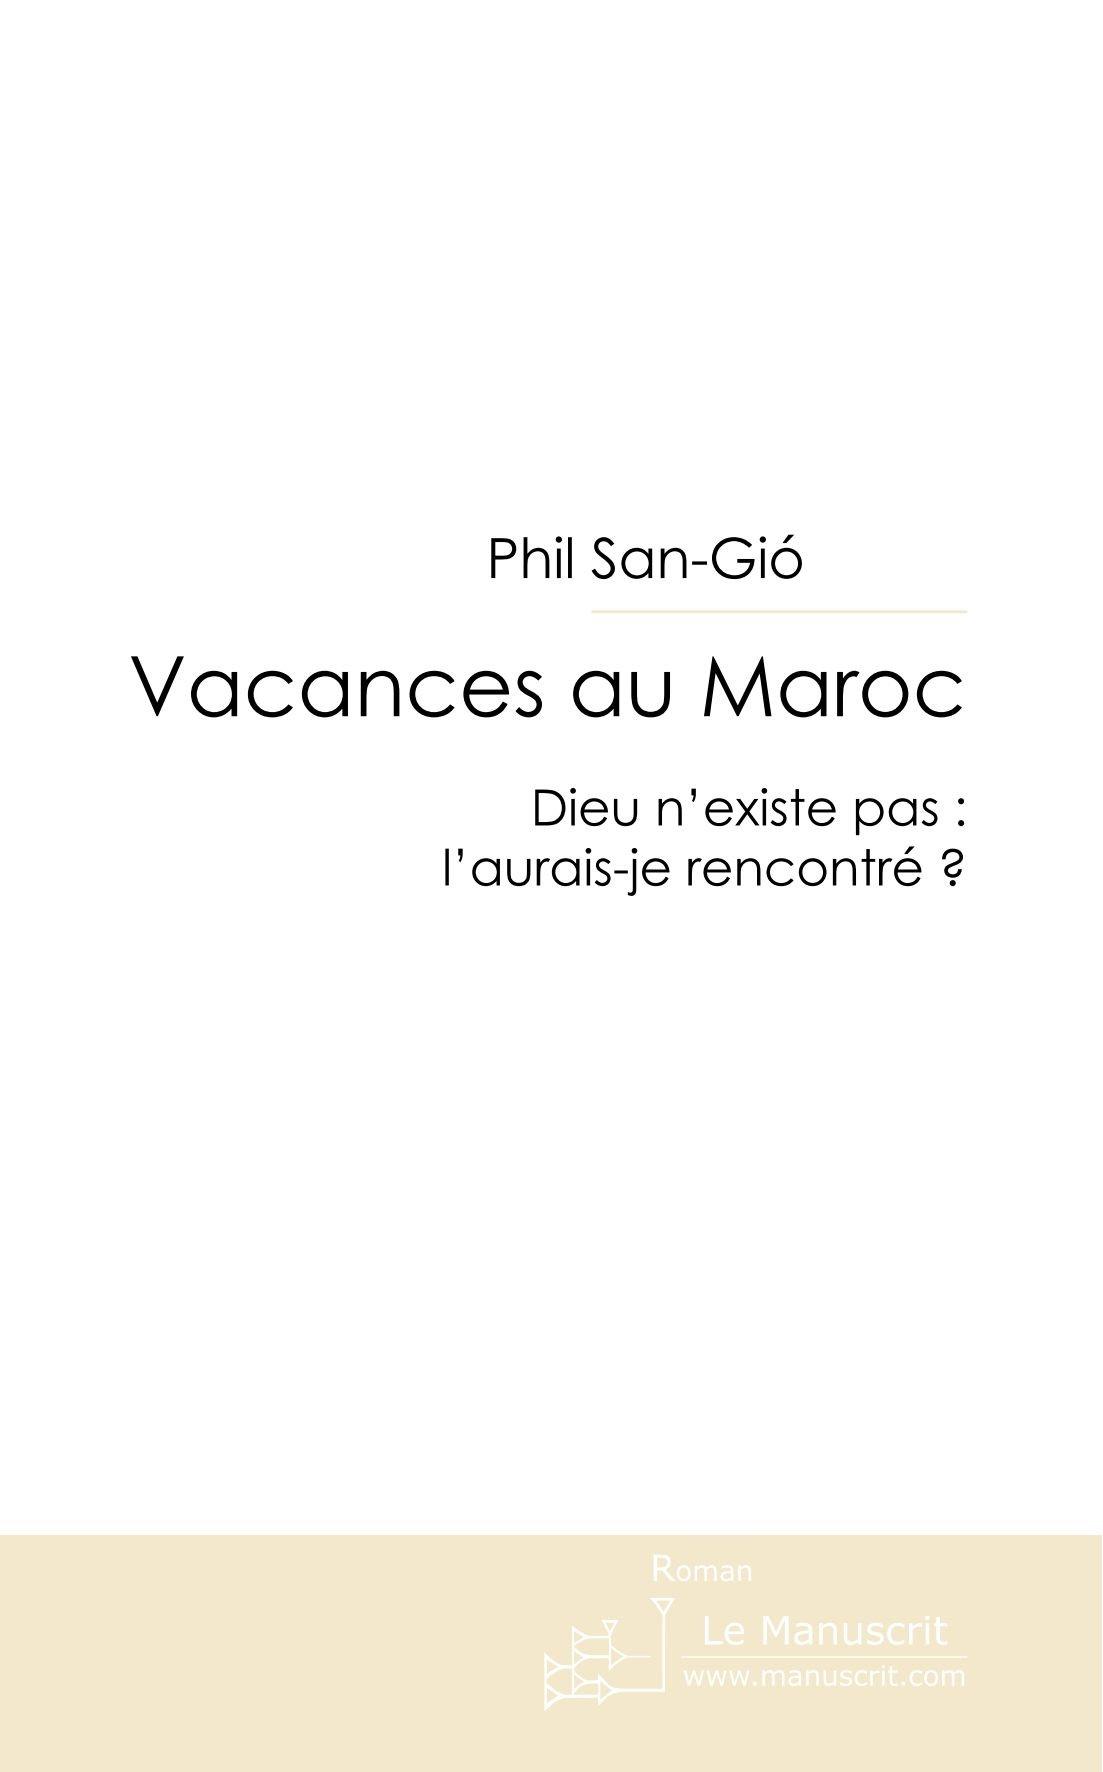 vacances au maroc Vacances au Maroc (French) Paperback u2013 16 Apr 2009